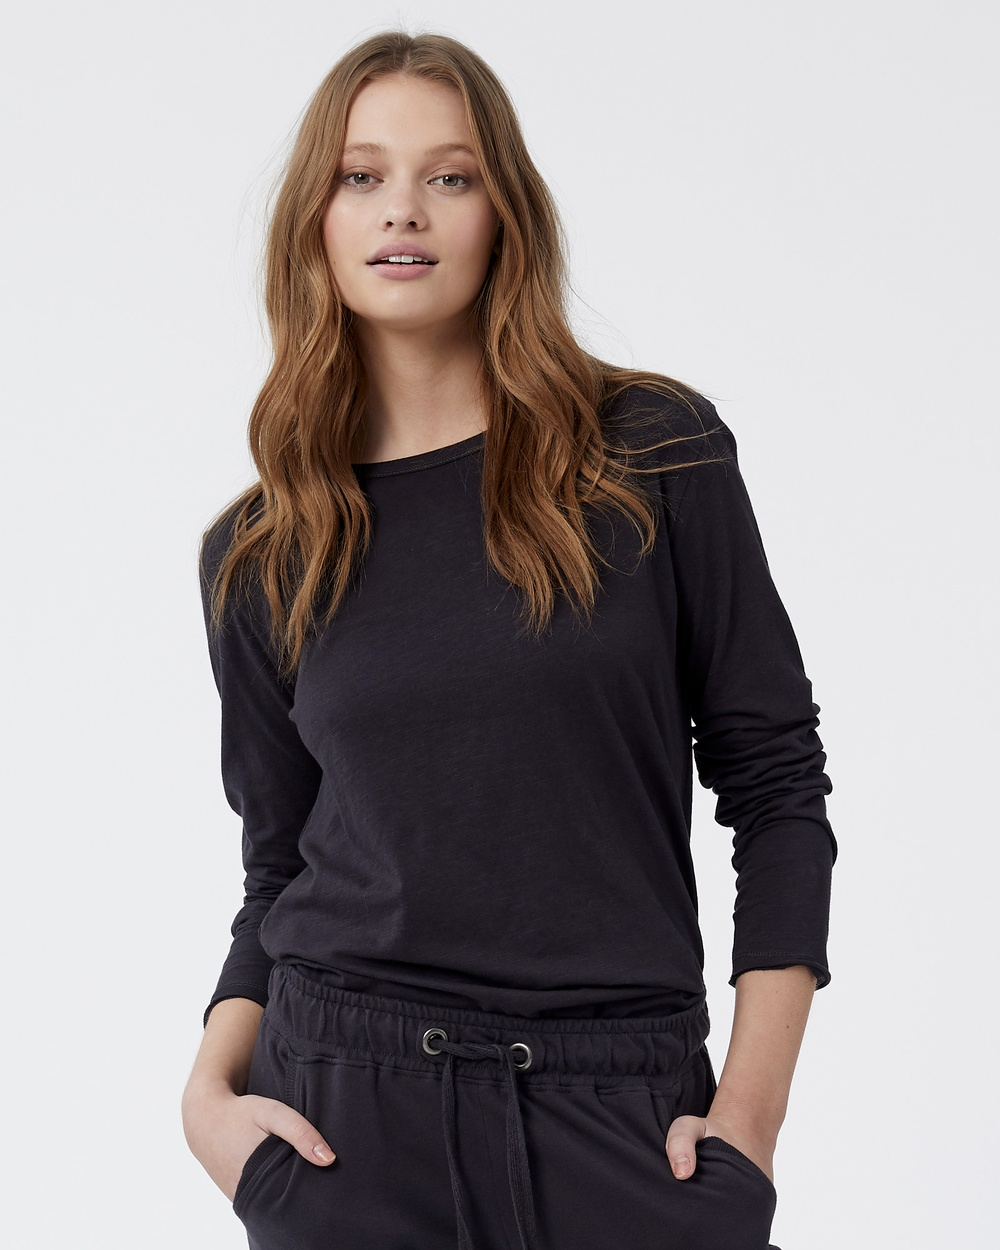 Jac & Mooki - Charlie Long Sleeve Tee - Long Sleeve T-Shirts (Vintage Black) Charlie Long Sleeve Tee